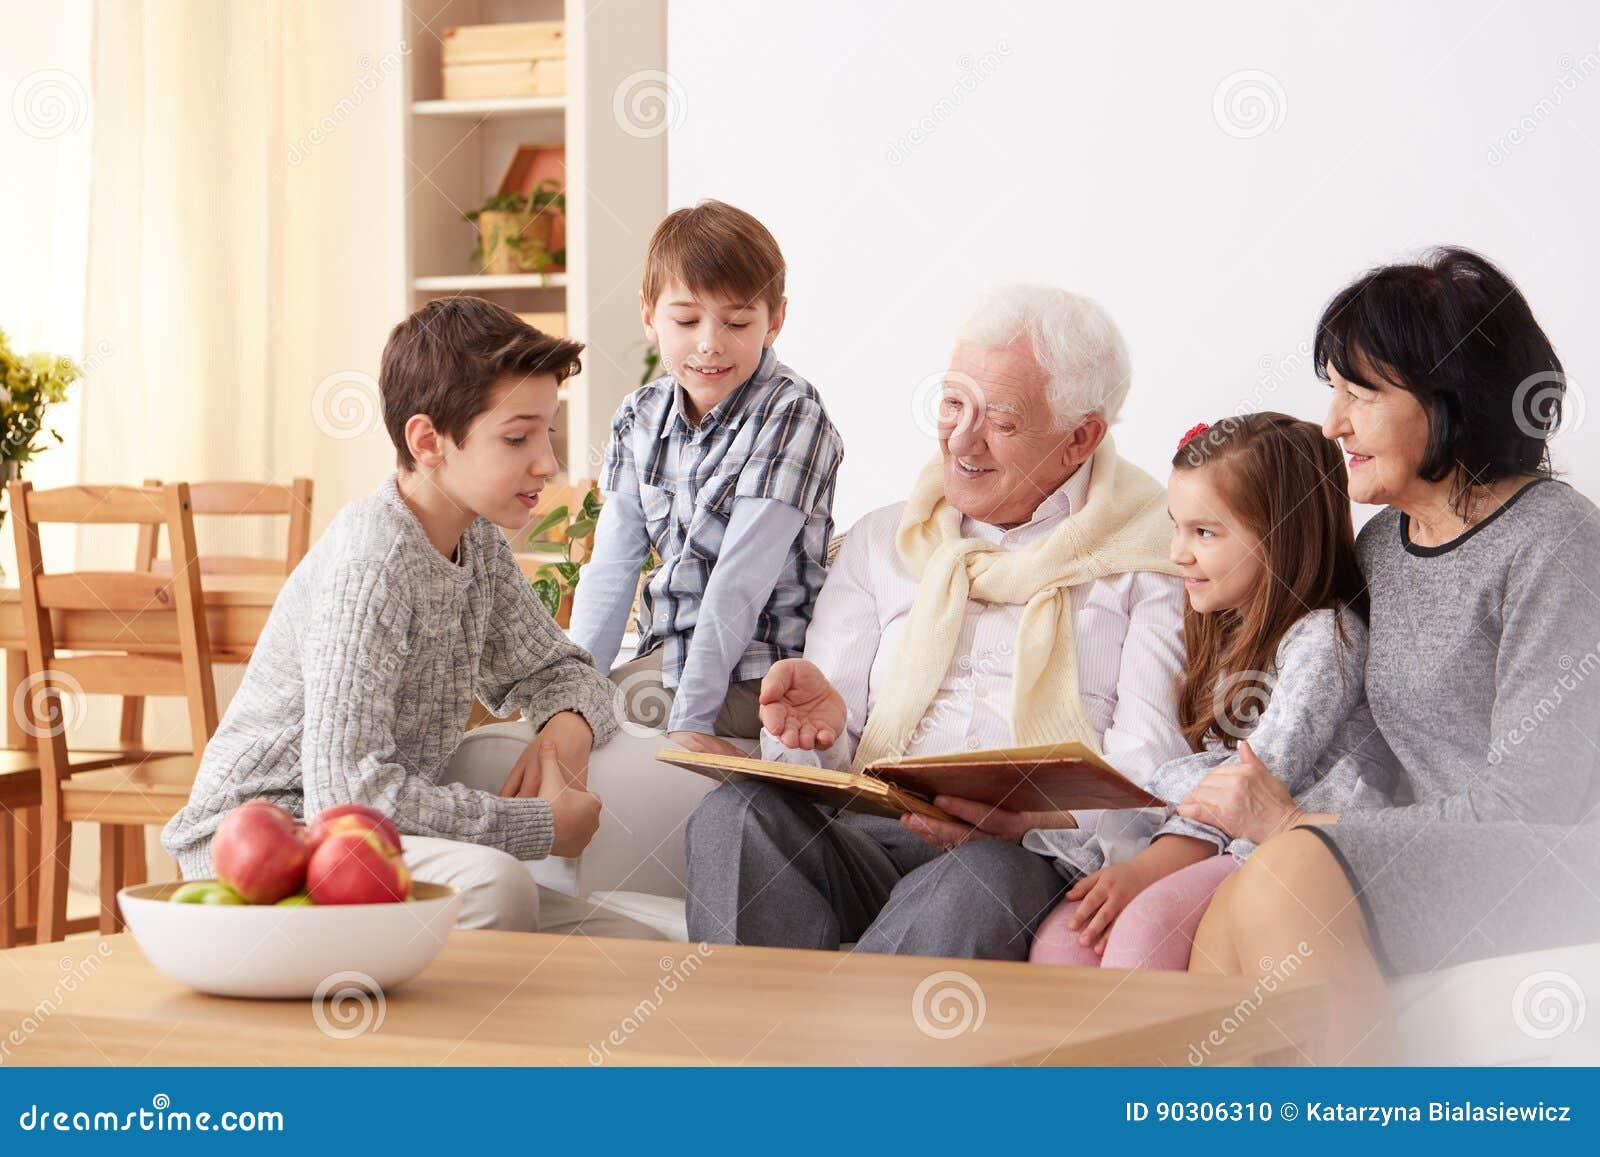 Grandparents and grandchildren with family album